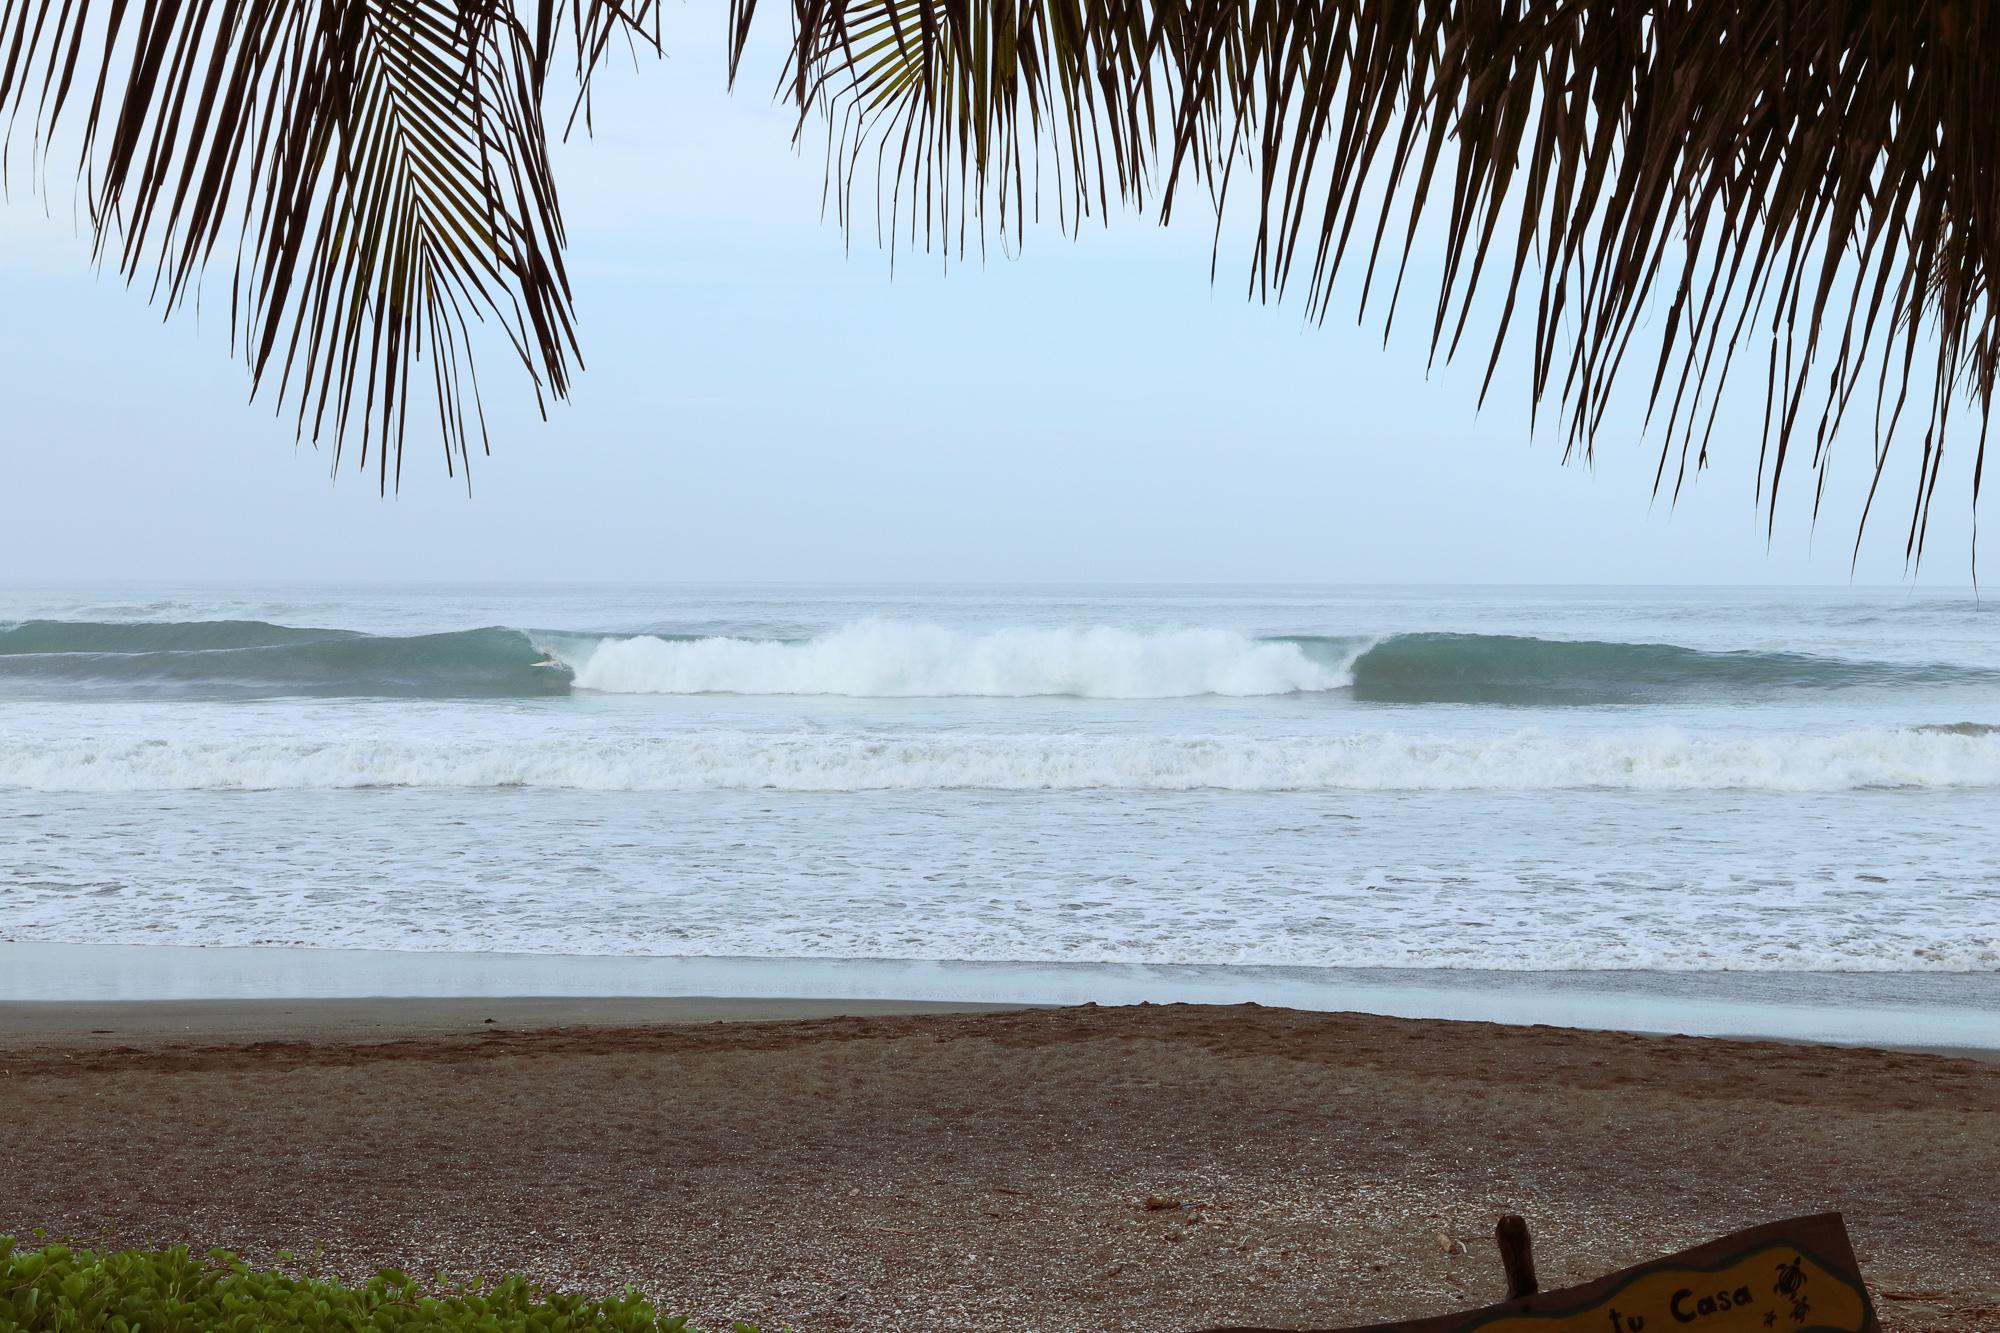 Costa Rica: August, 2019